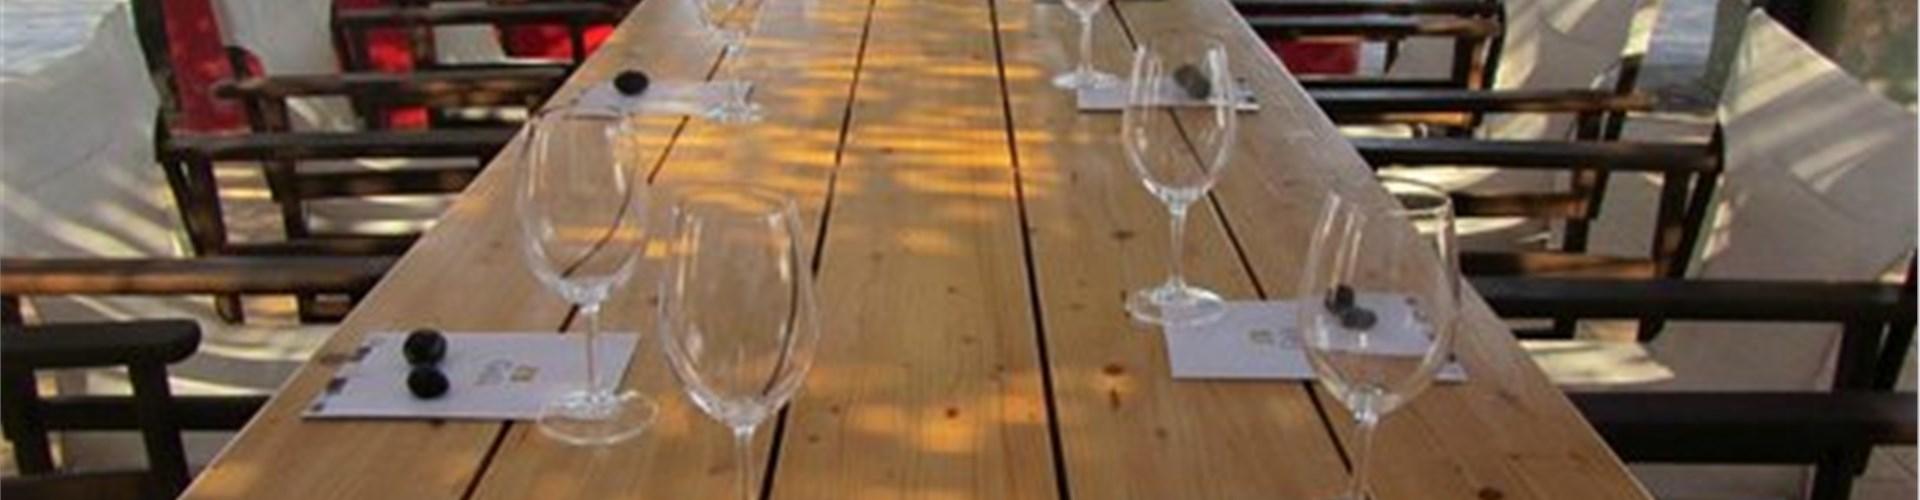 Gaia Winery Santorini - Wineries - Santorini